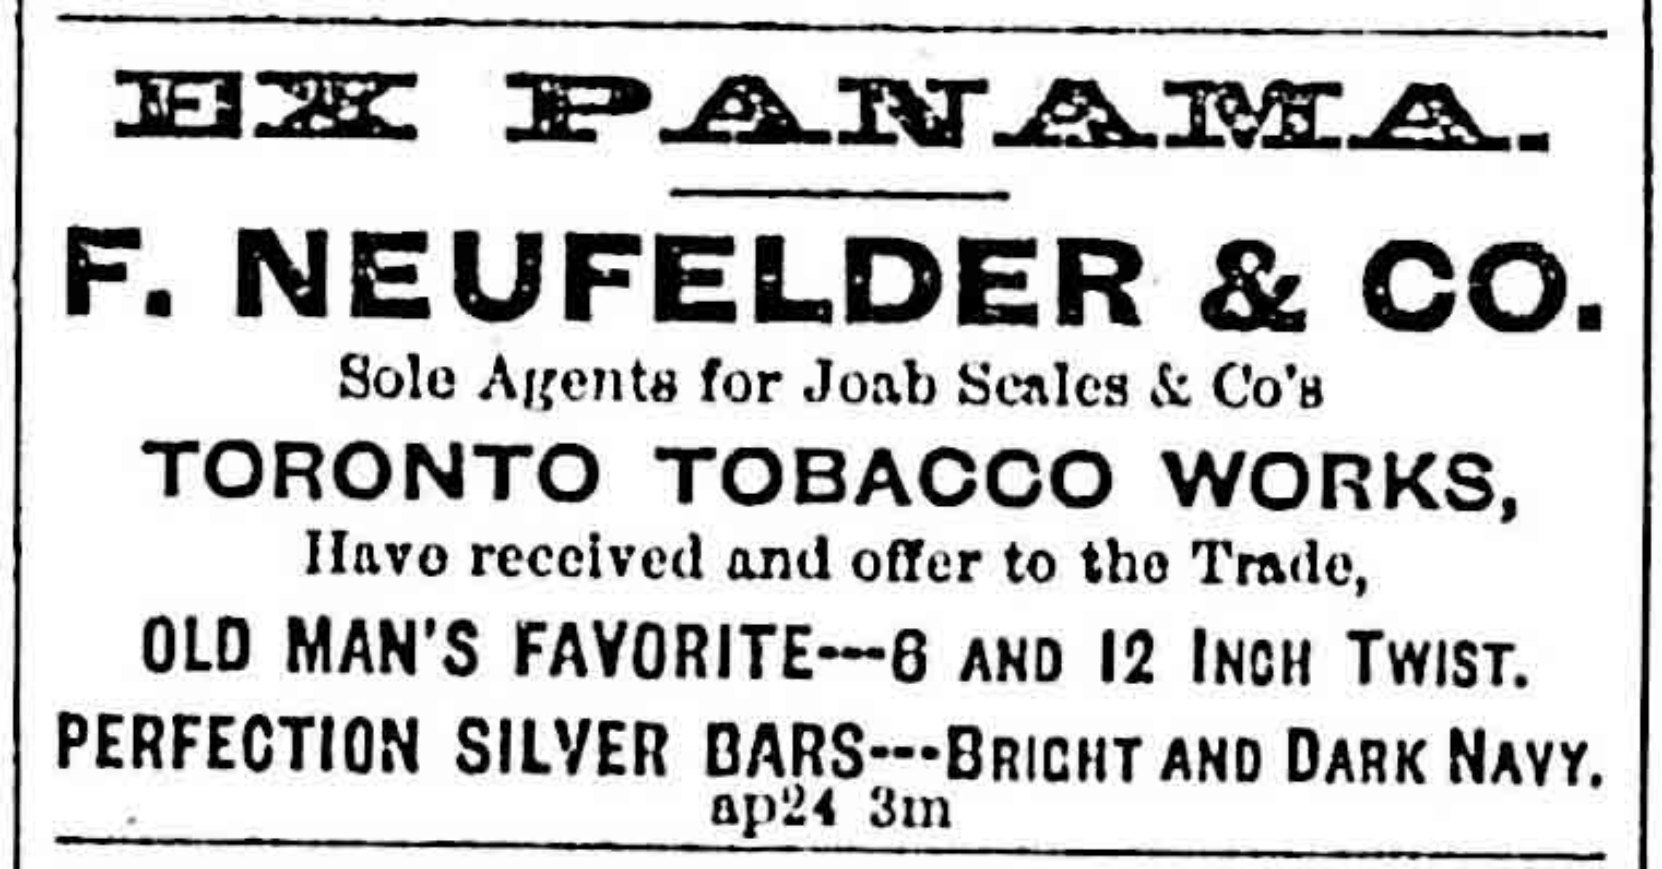 Advertisement for Felix Neufelder & Co., 1878.